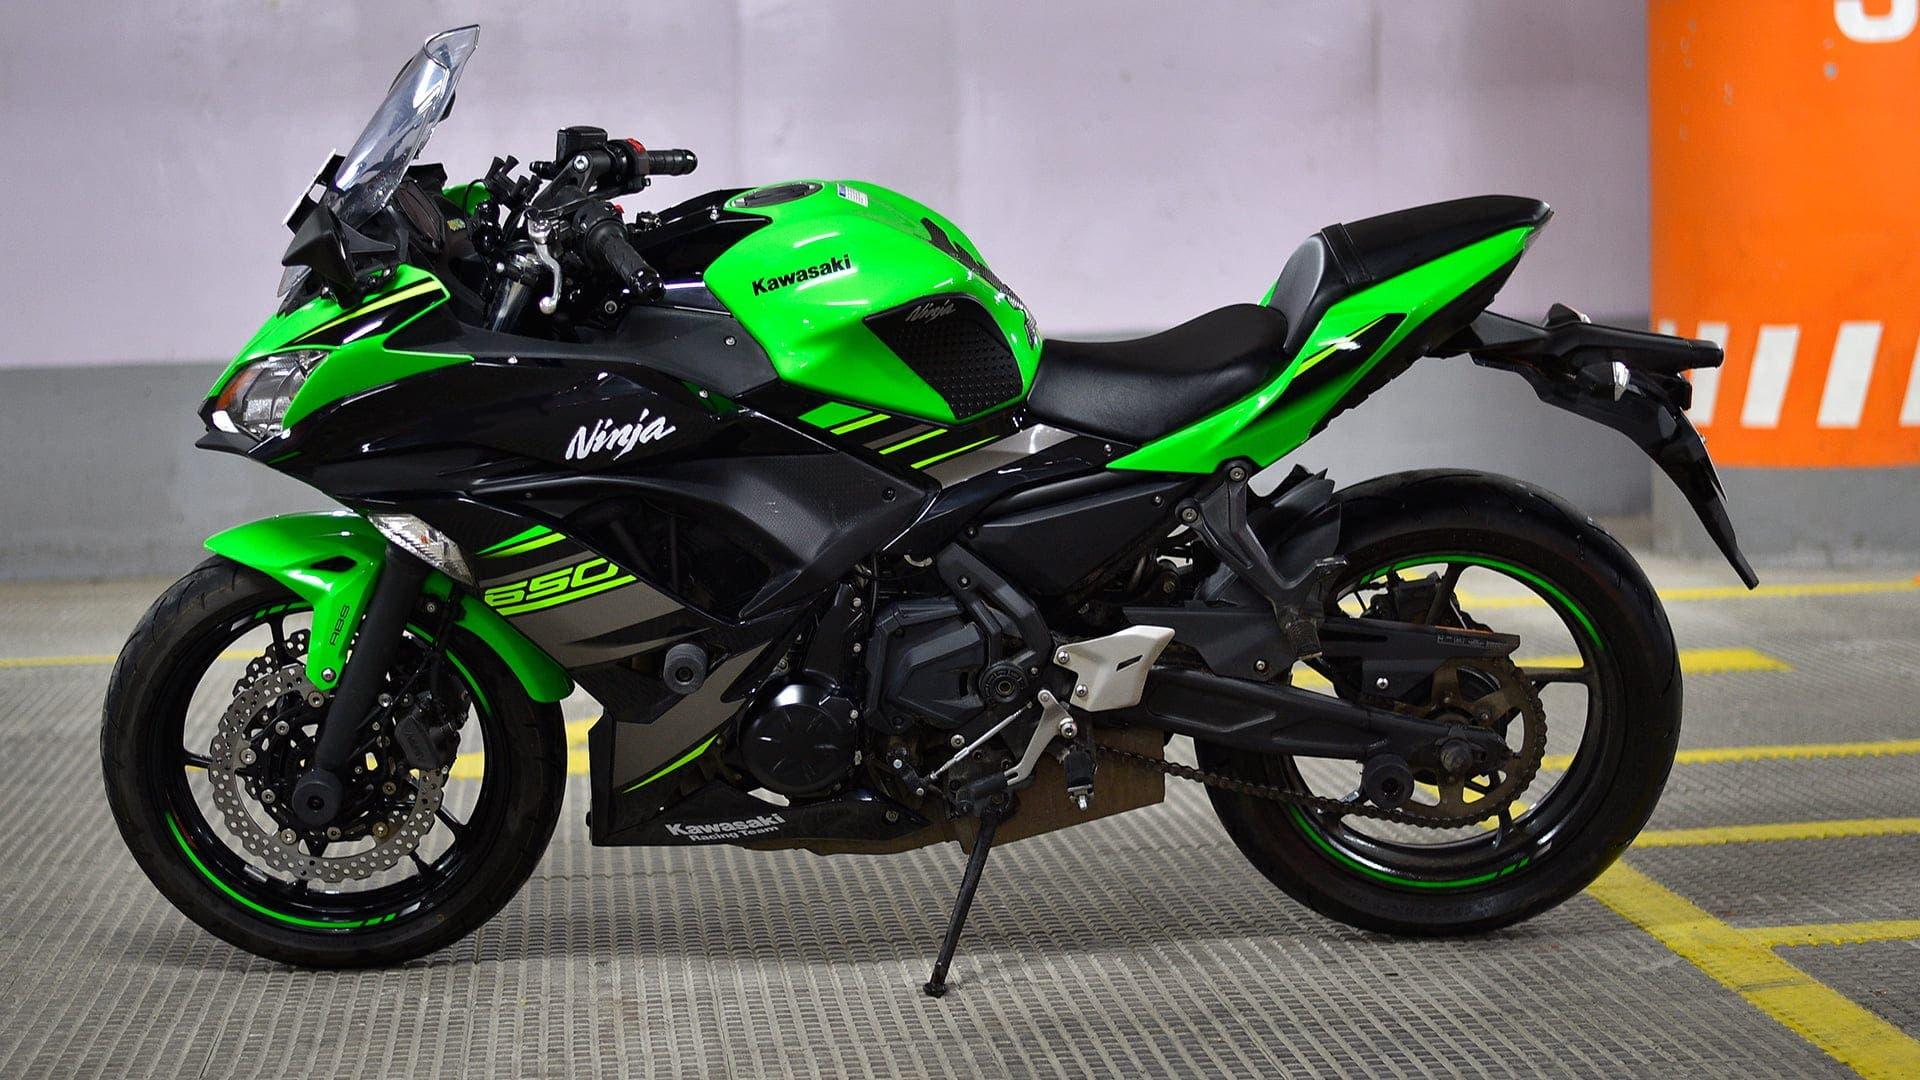 Comparativa Kawasaki Ninja 650 2020 - Kawasaki Ninja ZX-6R